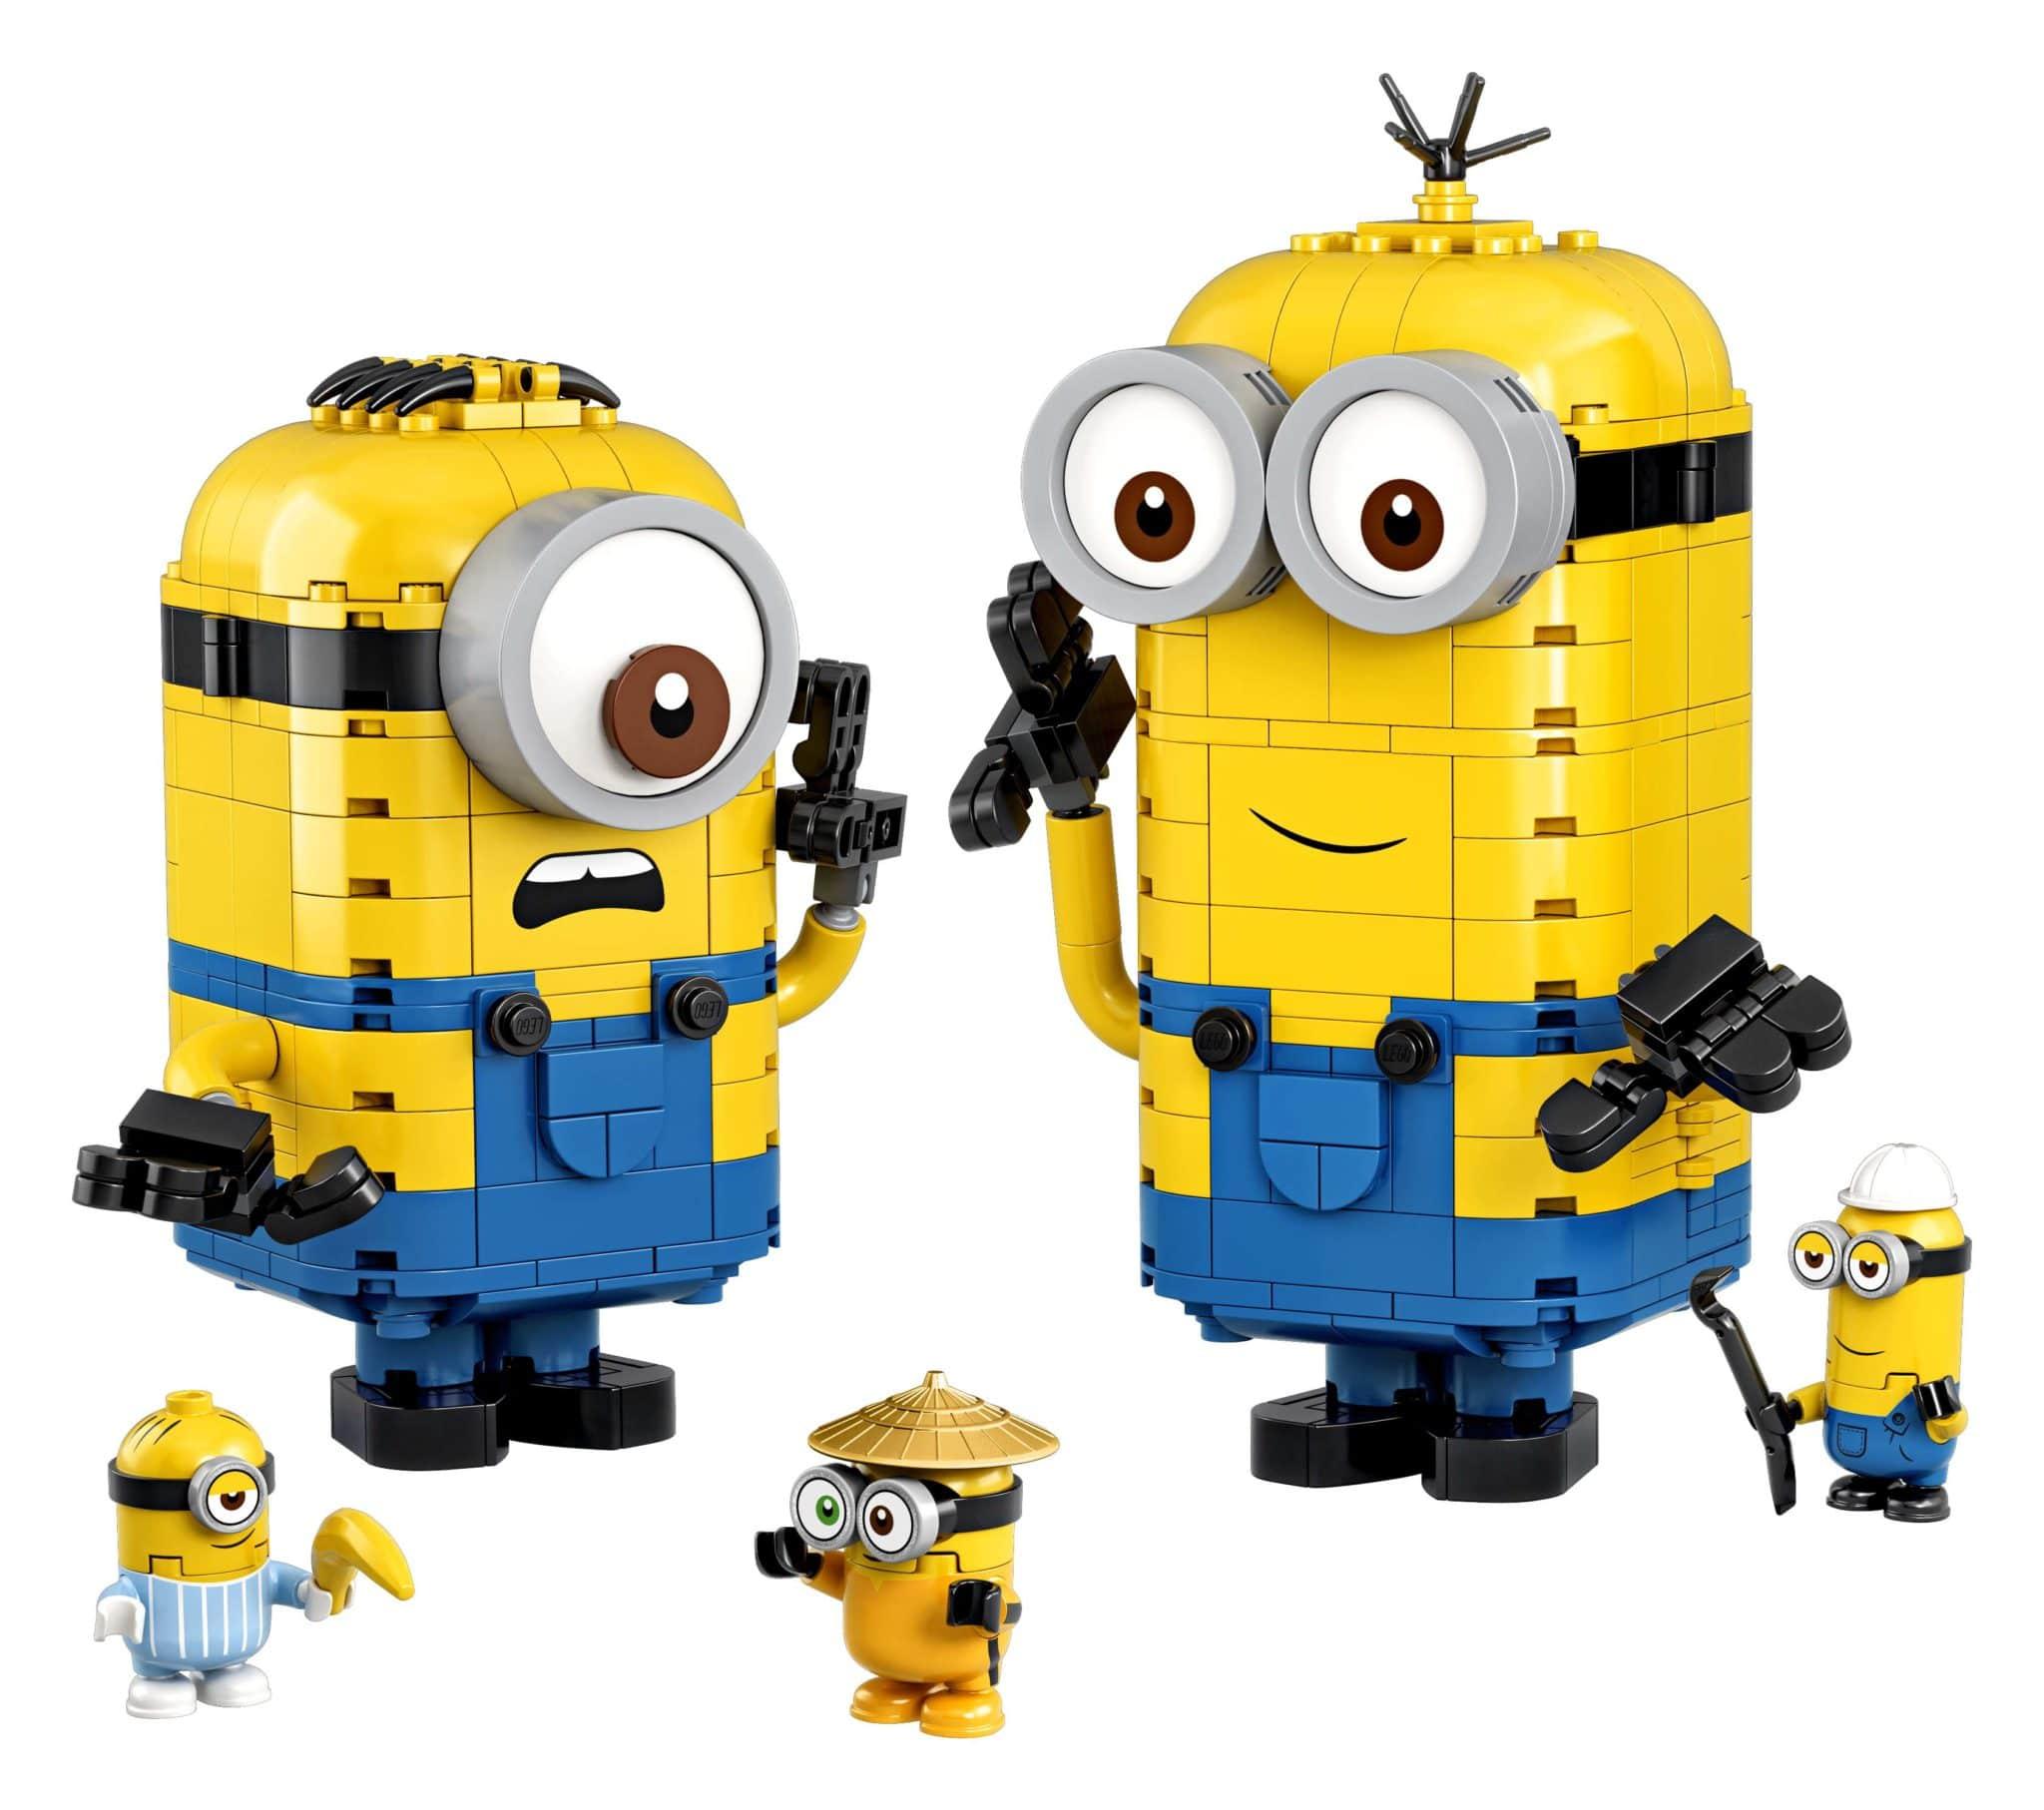 LEGO 75551 Brick Built Minions